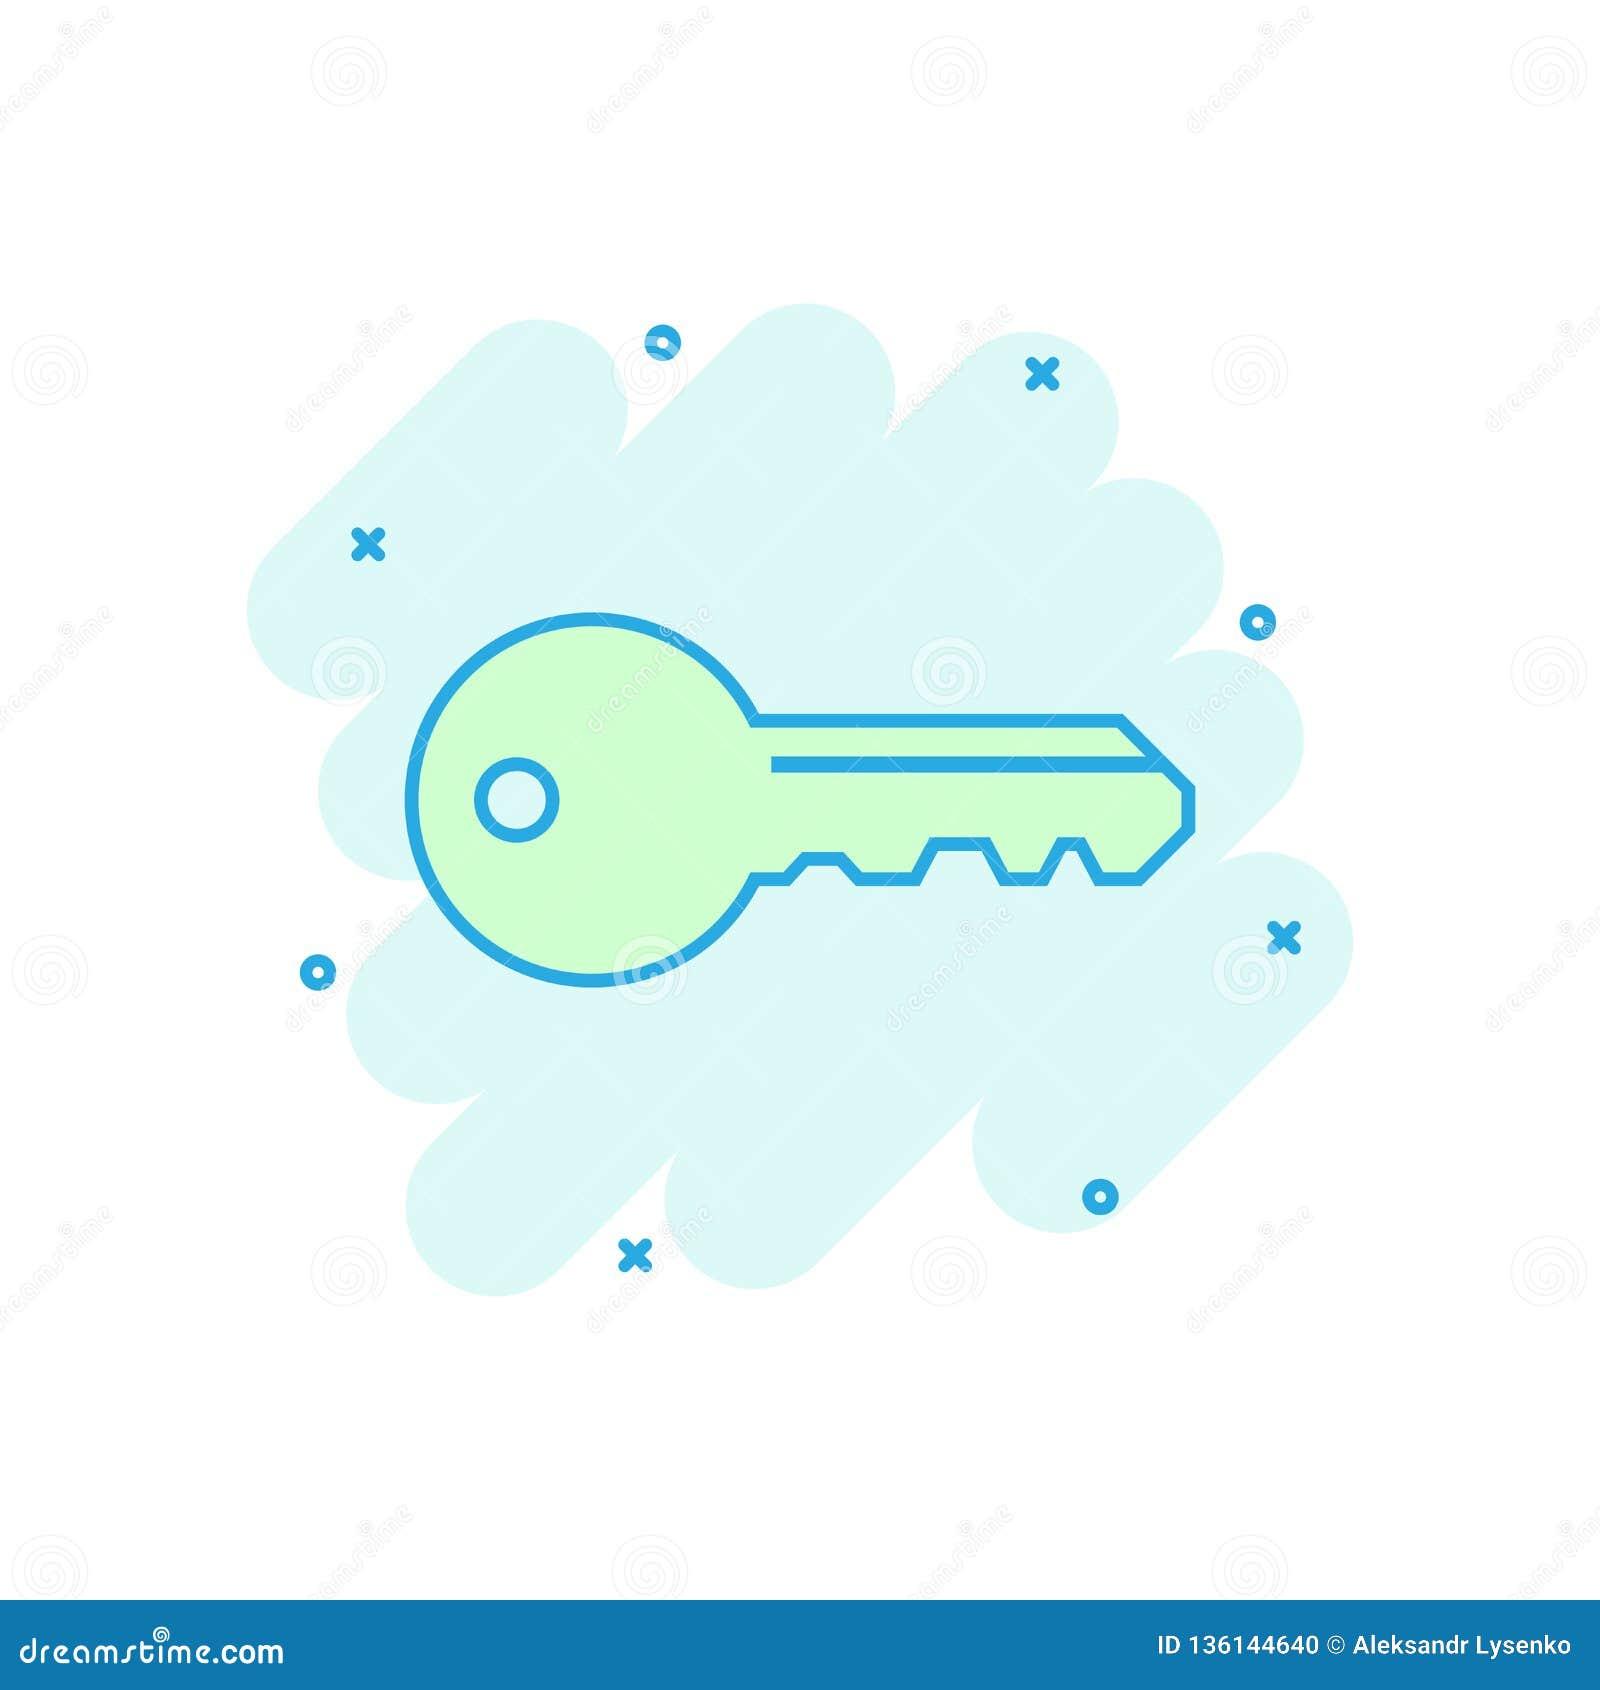 Key icon in comic style. Access login vector cartoon illustration pictogram. Password key business concept splash effect